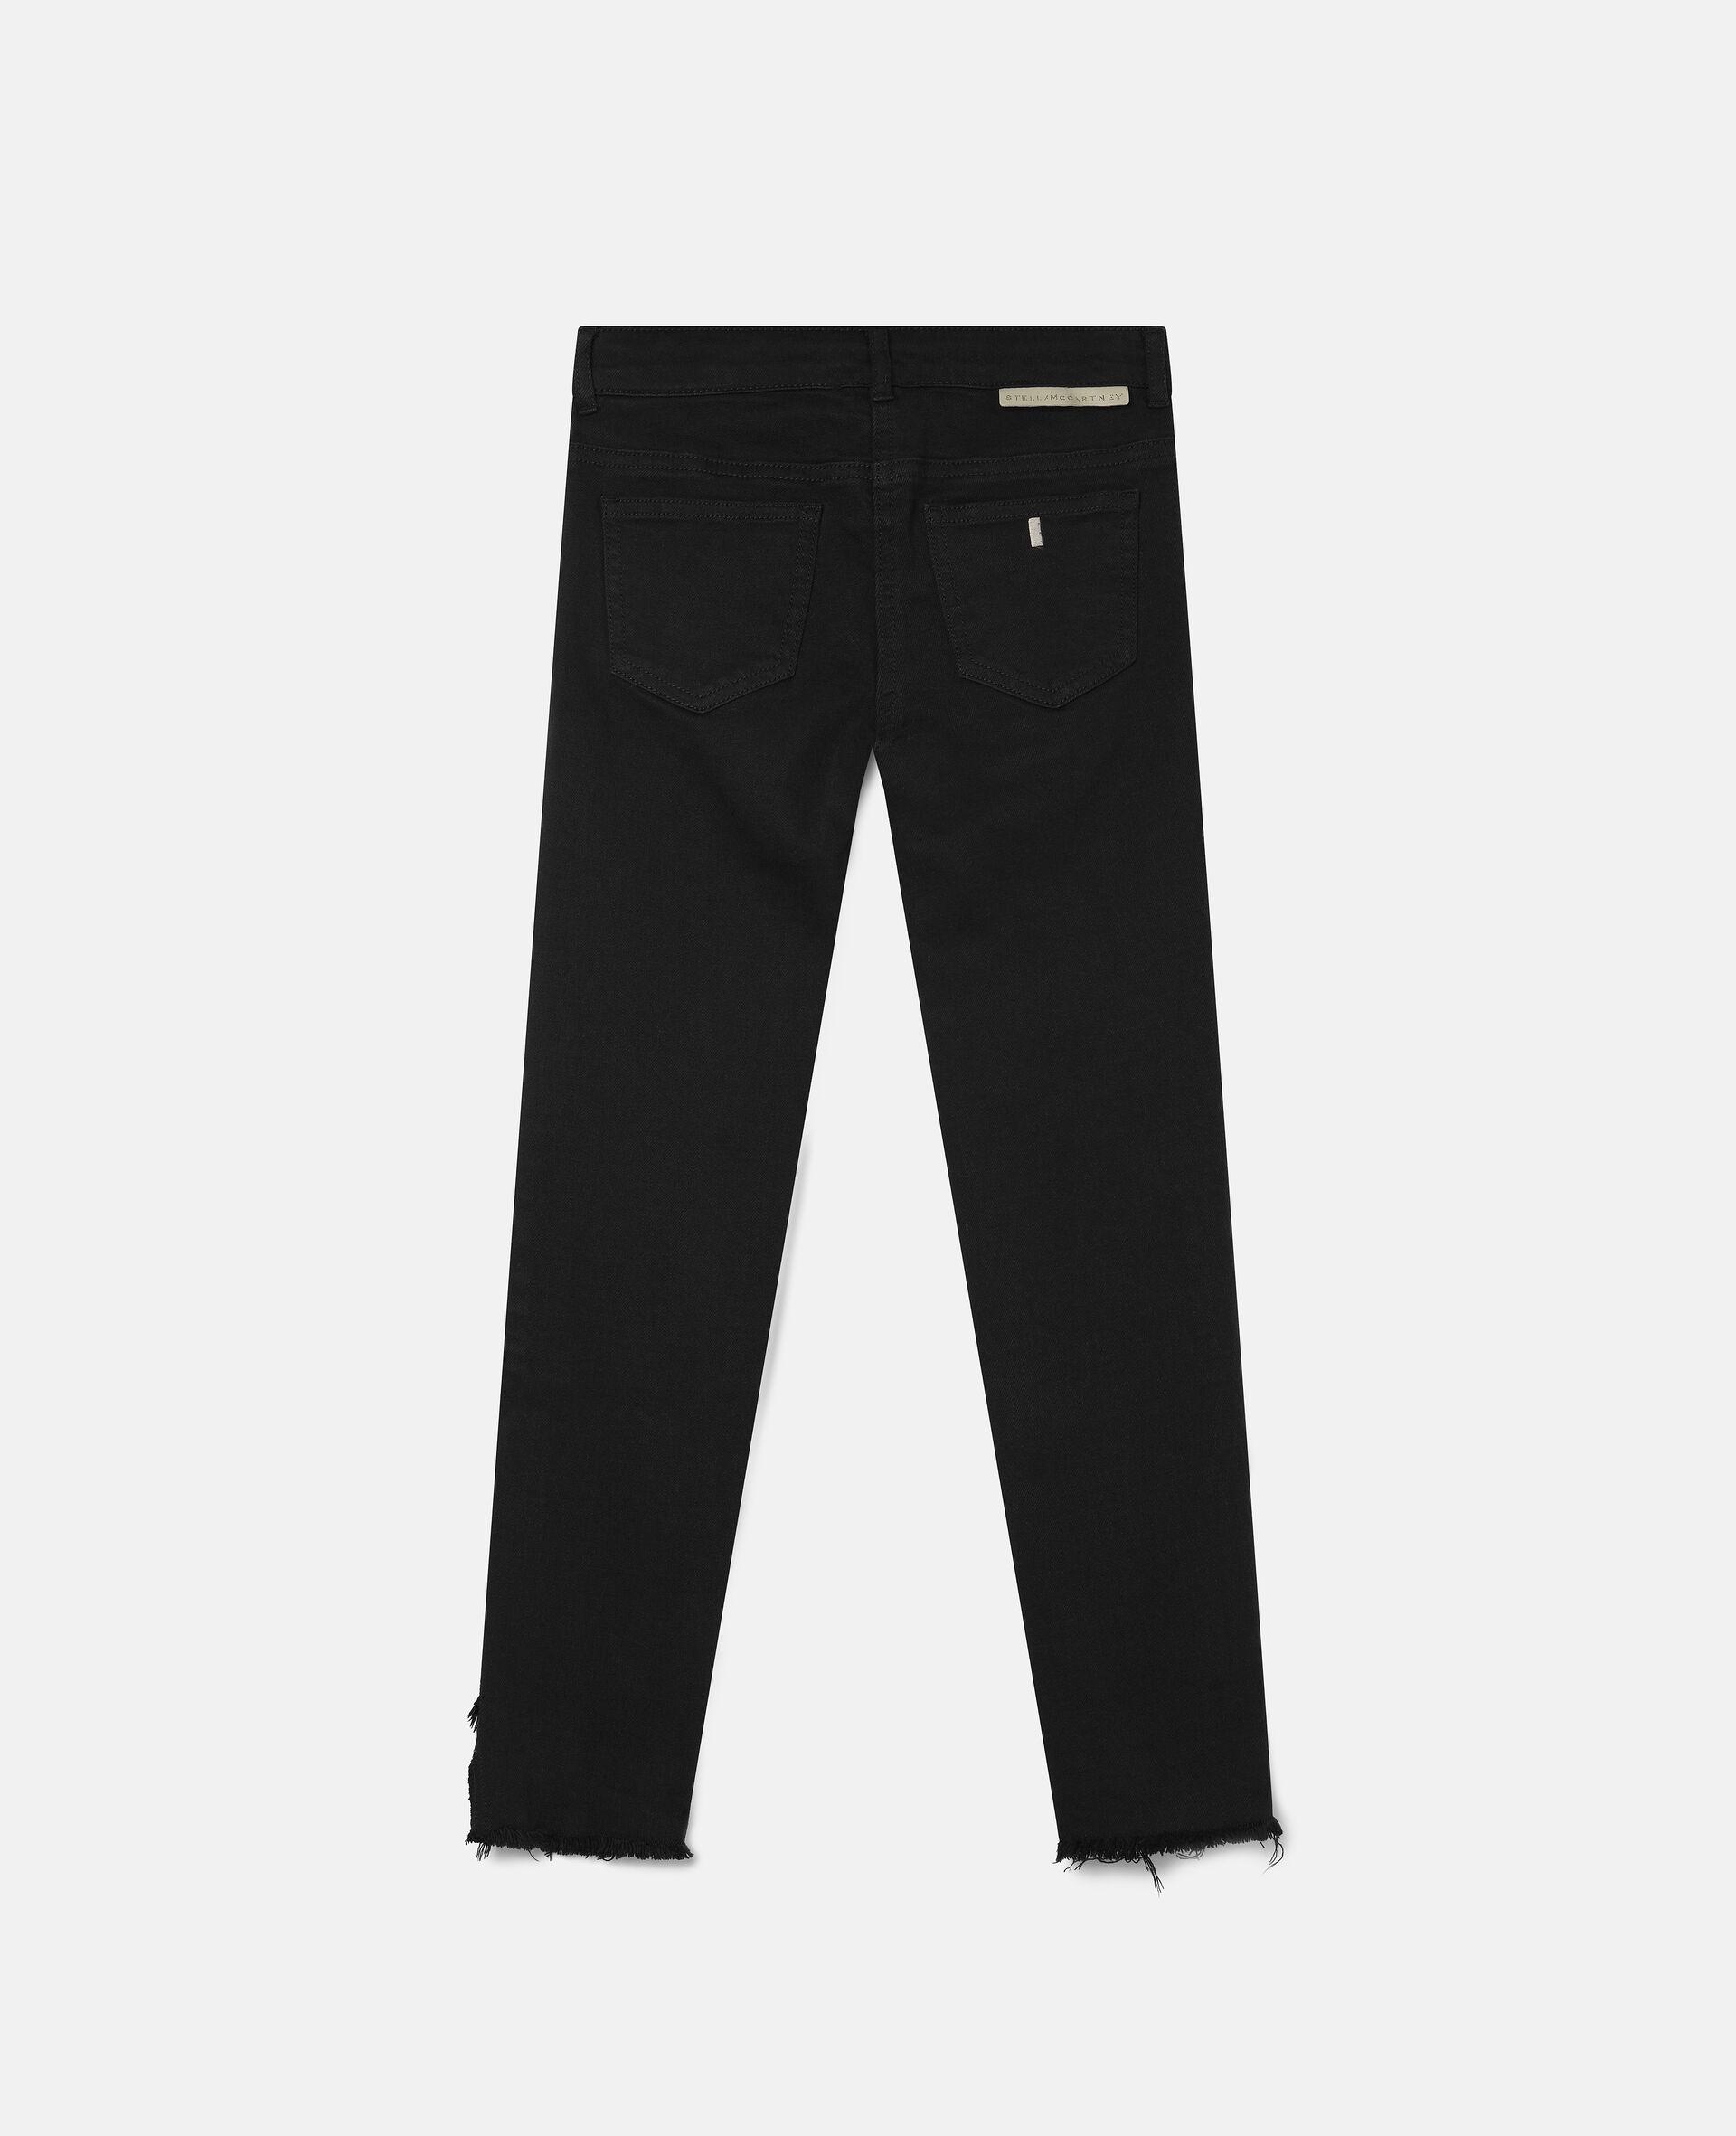 Denim Trousers-Black-large image number 3